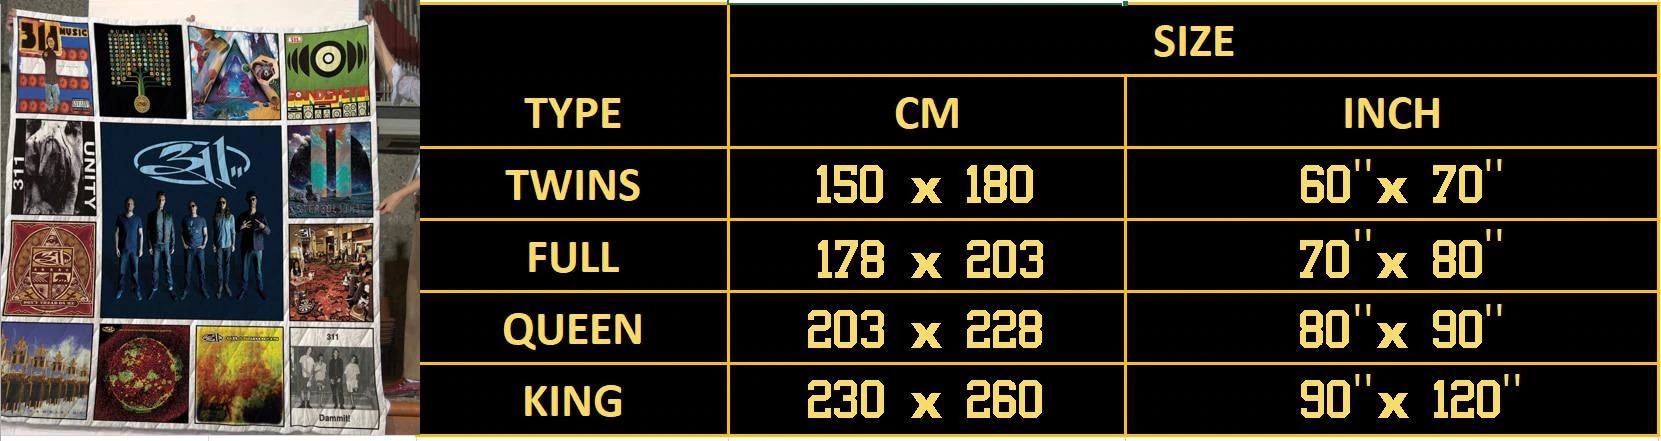 size-chart-exrain.jpg